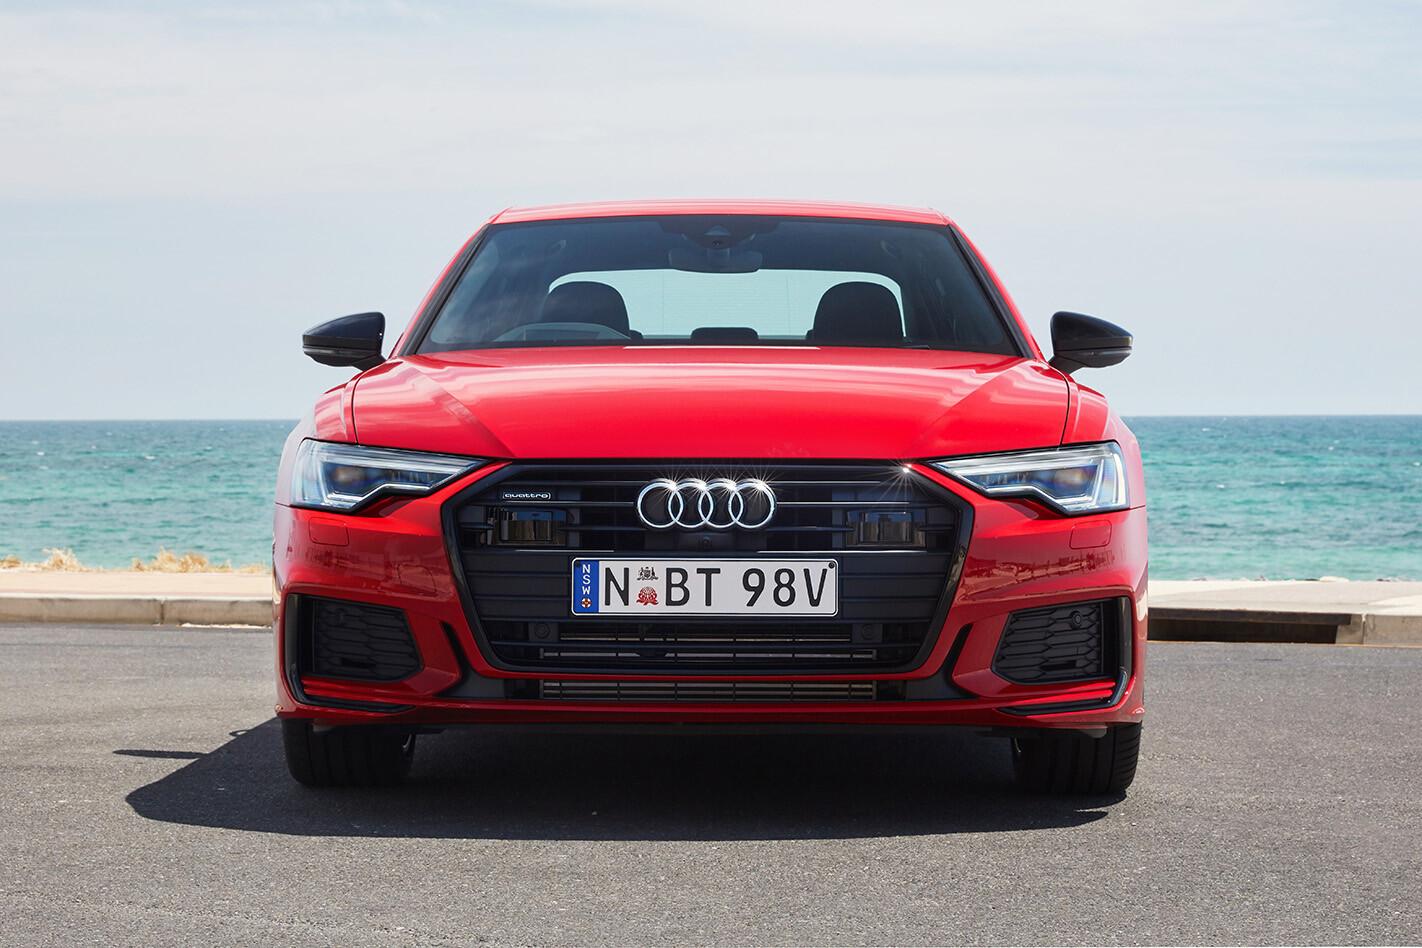 Audi A6 45 TFSI front end